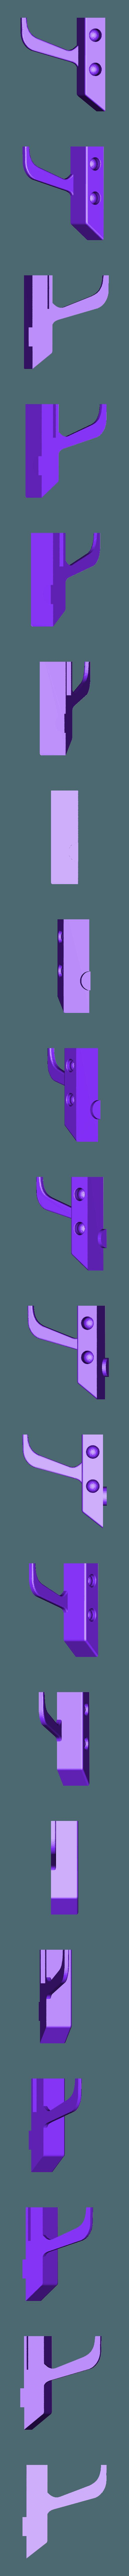 handgrip_right_2.stl Download free STL file 9 gague plasma pistol with barrel tip cover (MPMS mini) • 3D print template, PM_ME_YOUR_VALUE